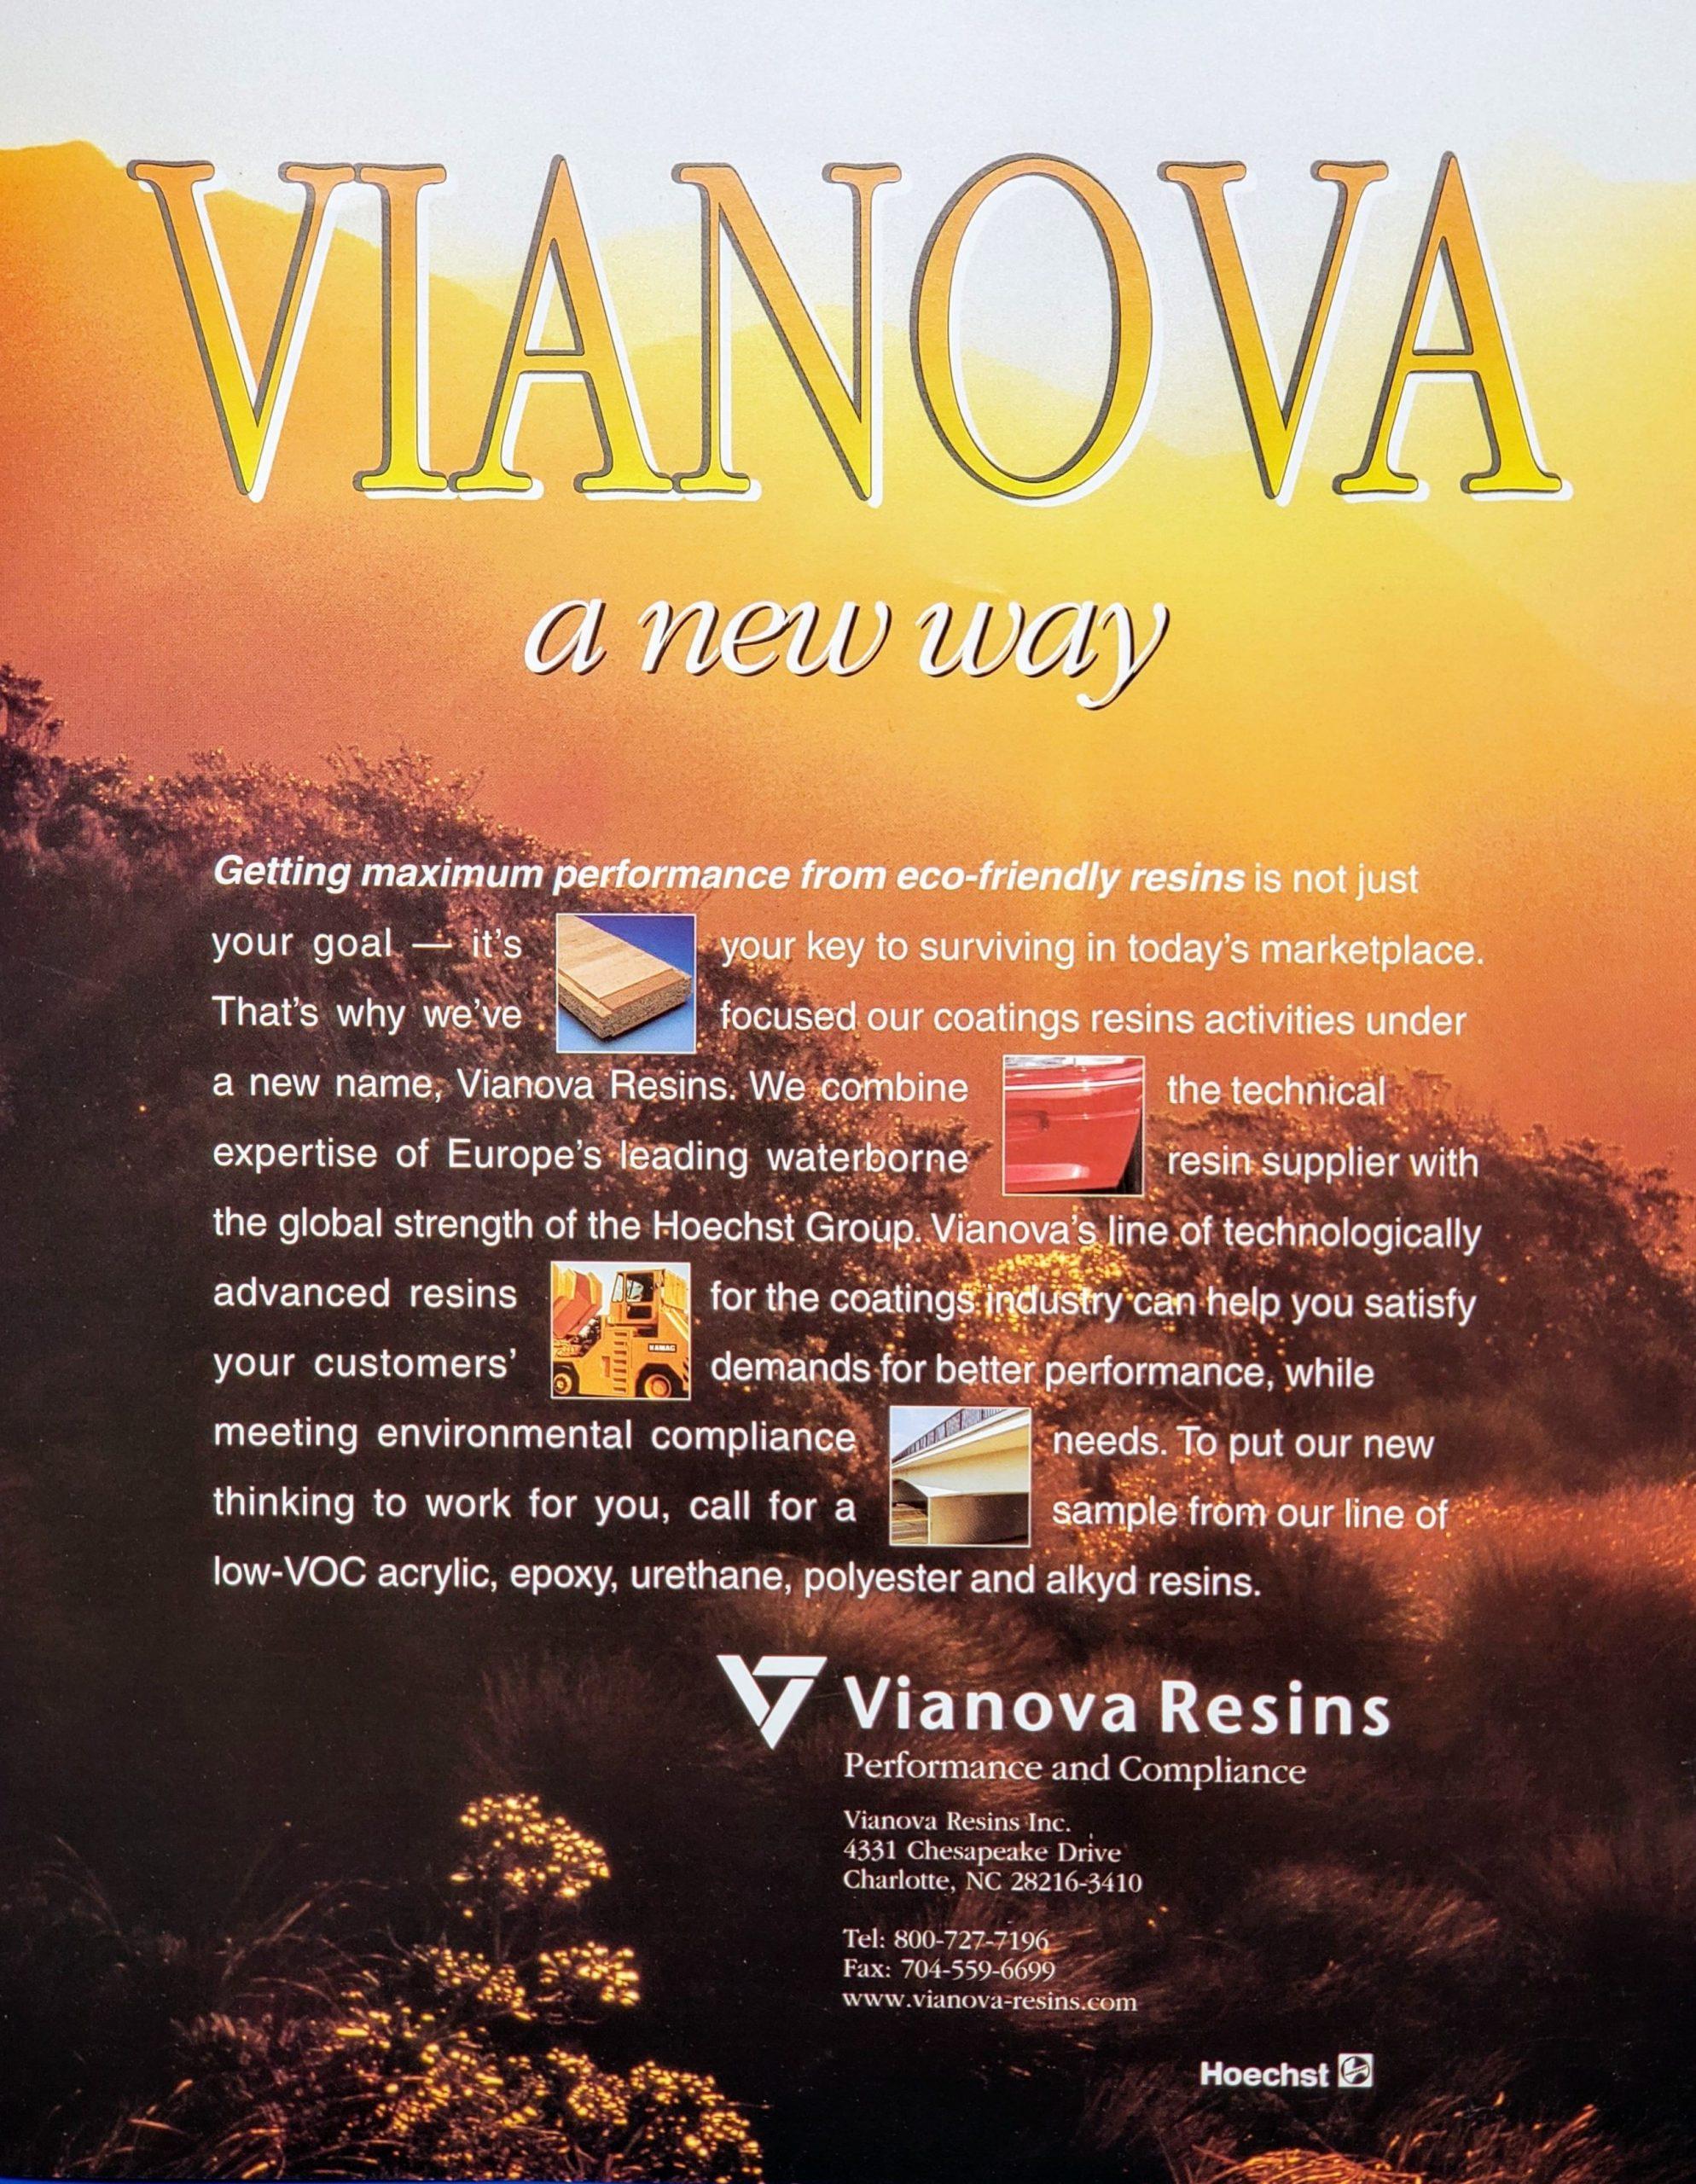 vianova resins_new way_ad_1